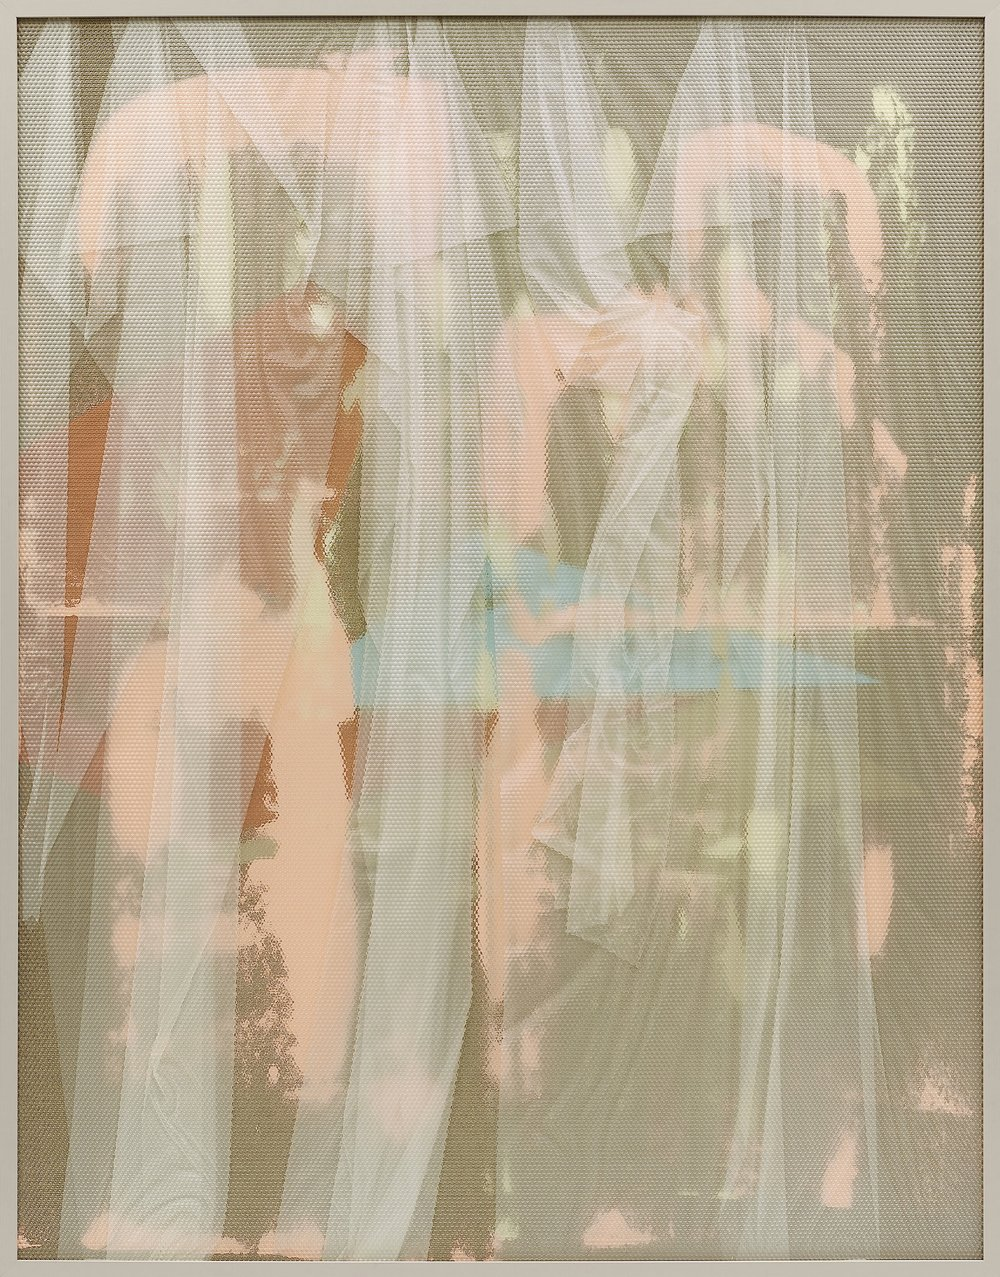 Eidolon / Part VI,  2013 Oil, acrylic and latex on canvas beneath textured Plexiglas 180 x 140 cm (71 x 55 in)